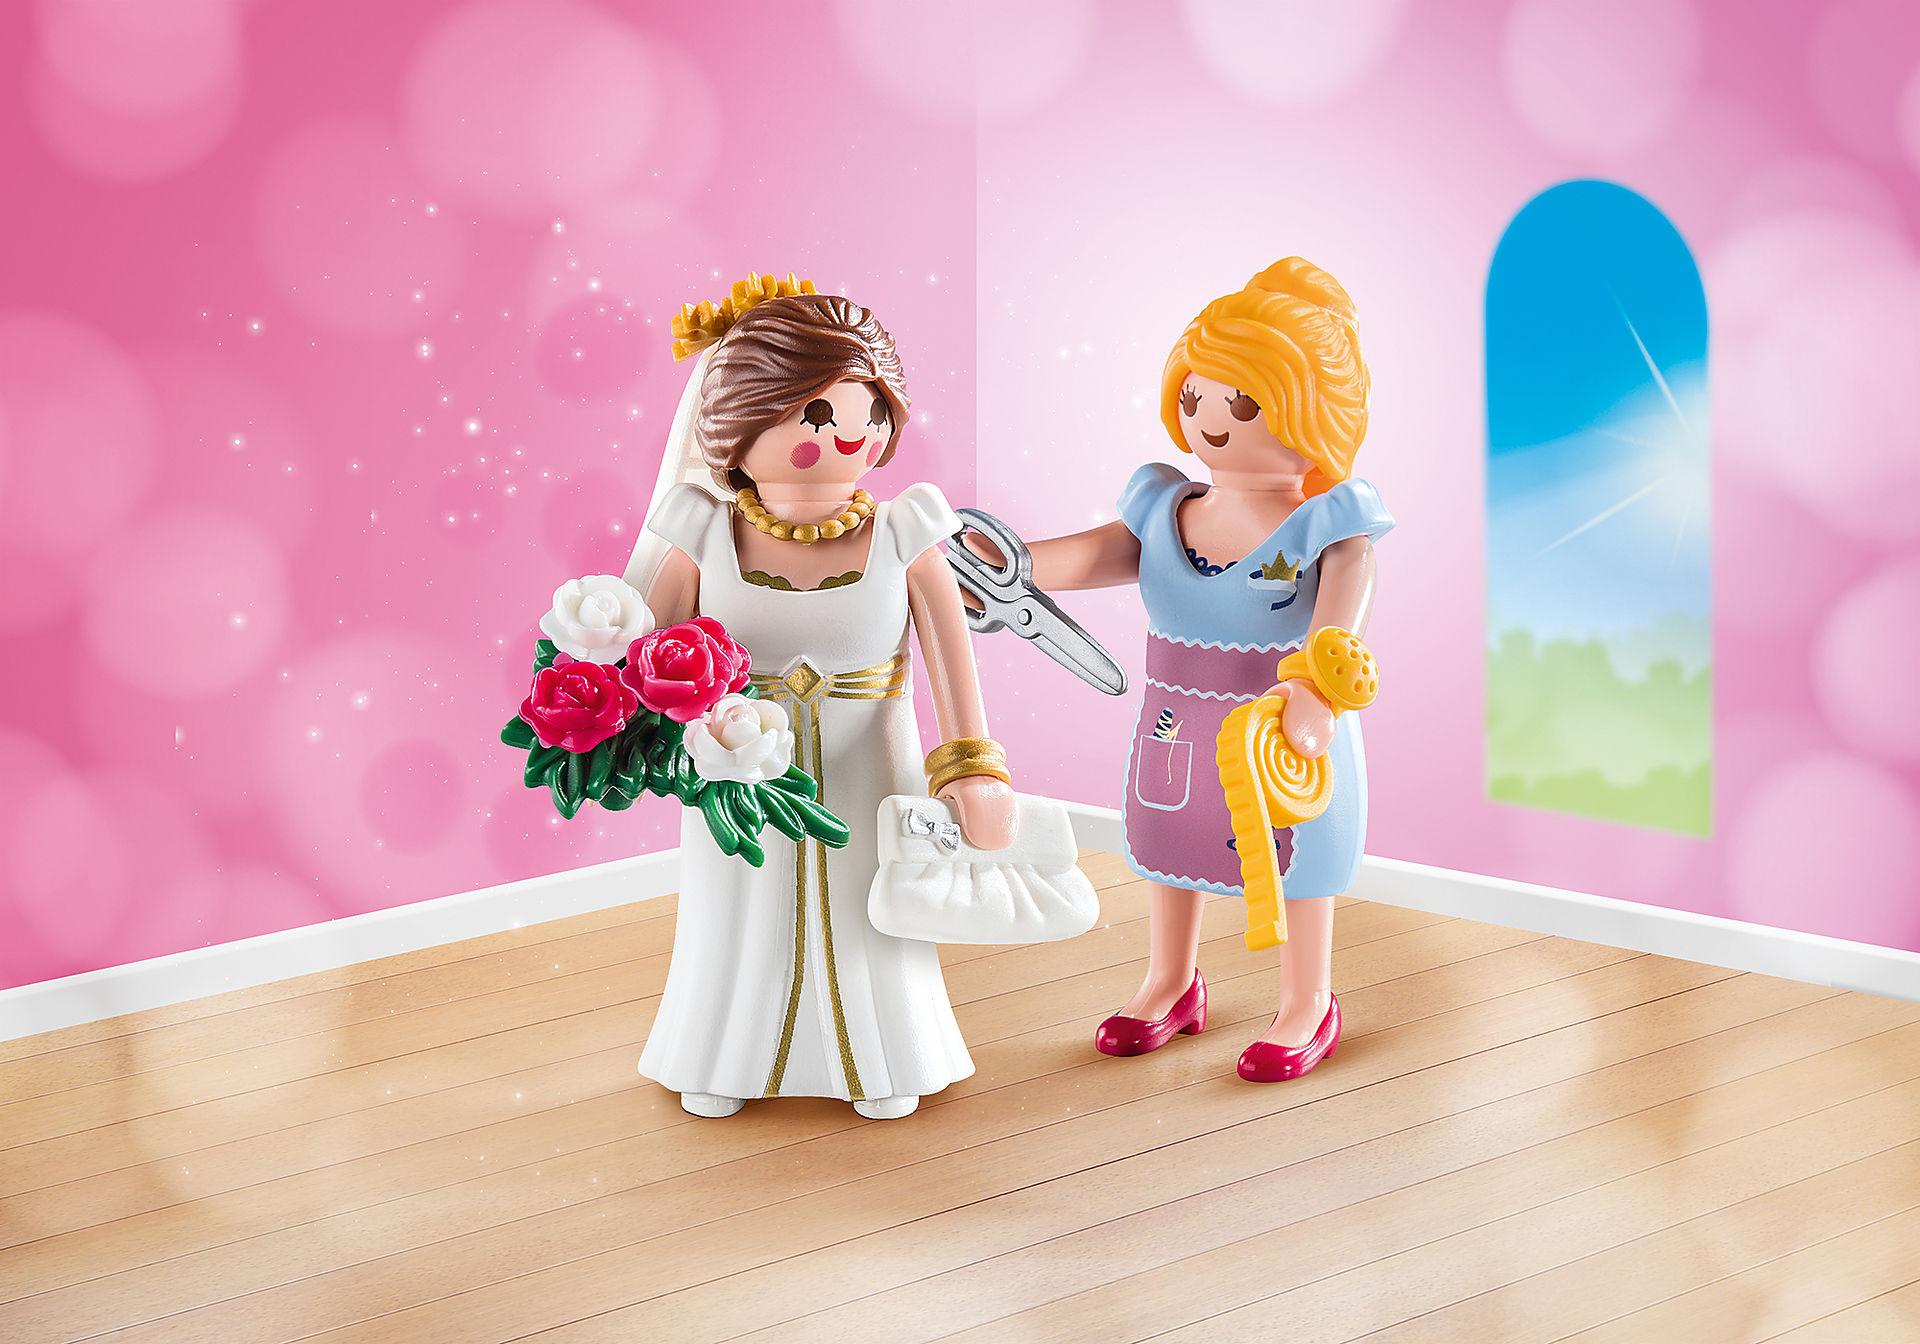 70275 Princesse et styliste  zoom image1